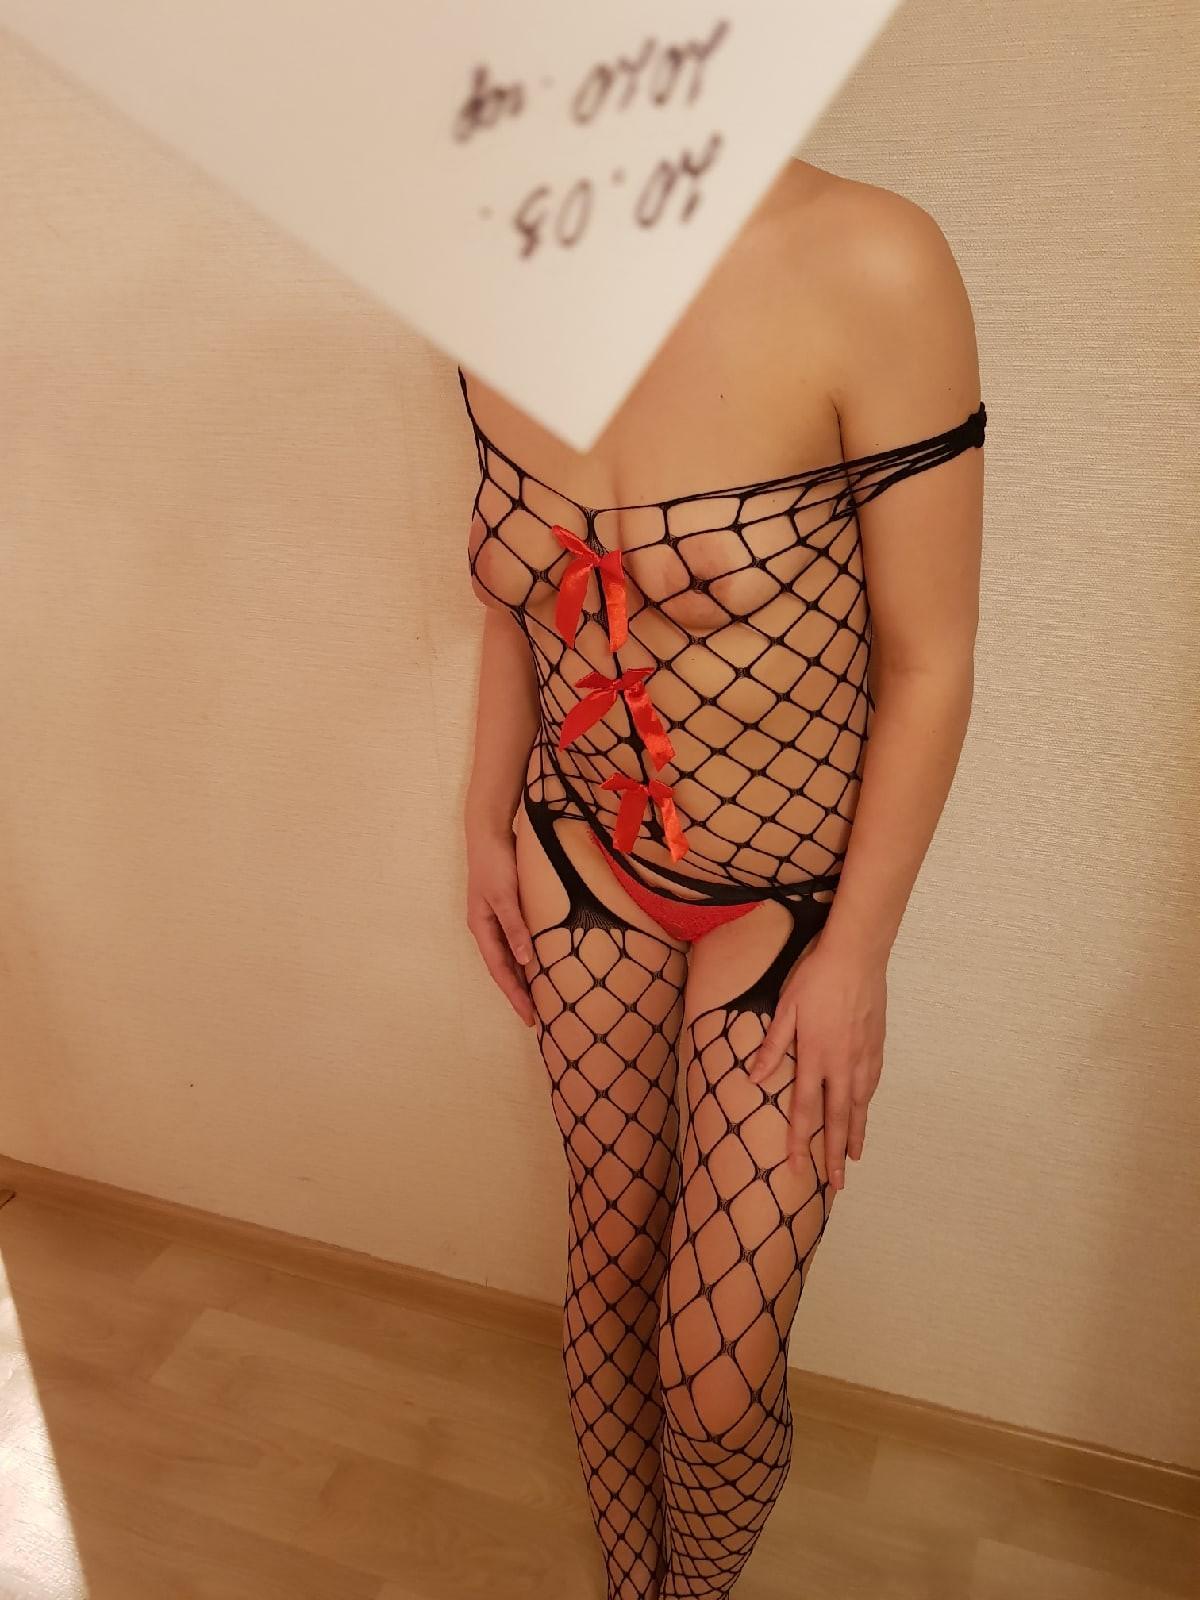 Проститутка Карина - Калининград